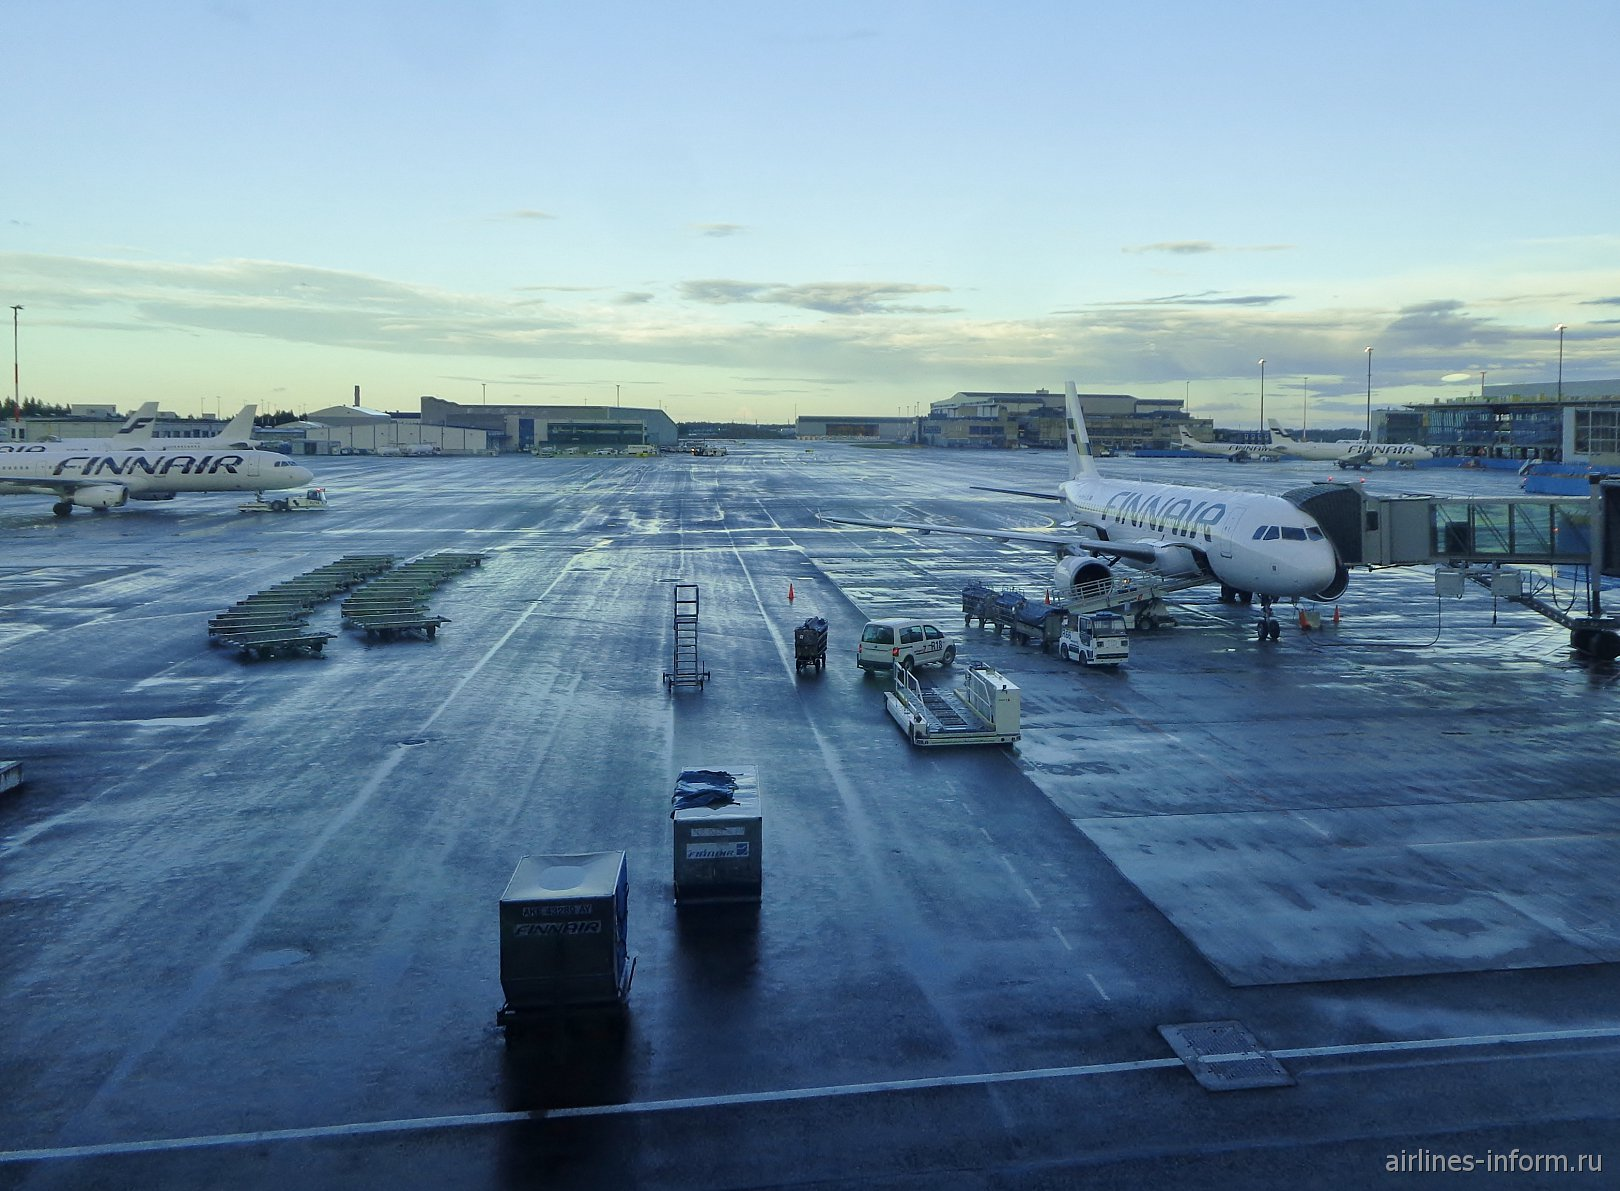 Перрон аэропорта Хельсинки Вантаа